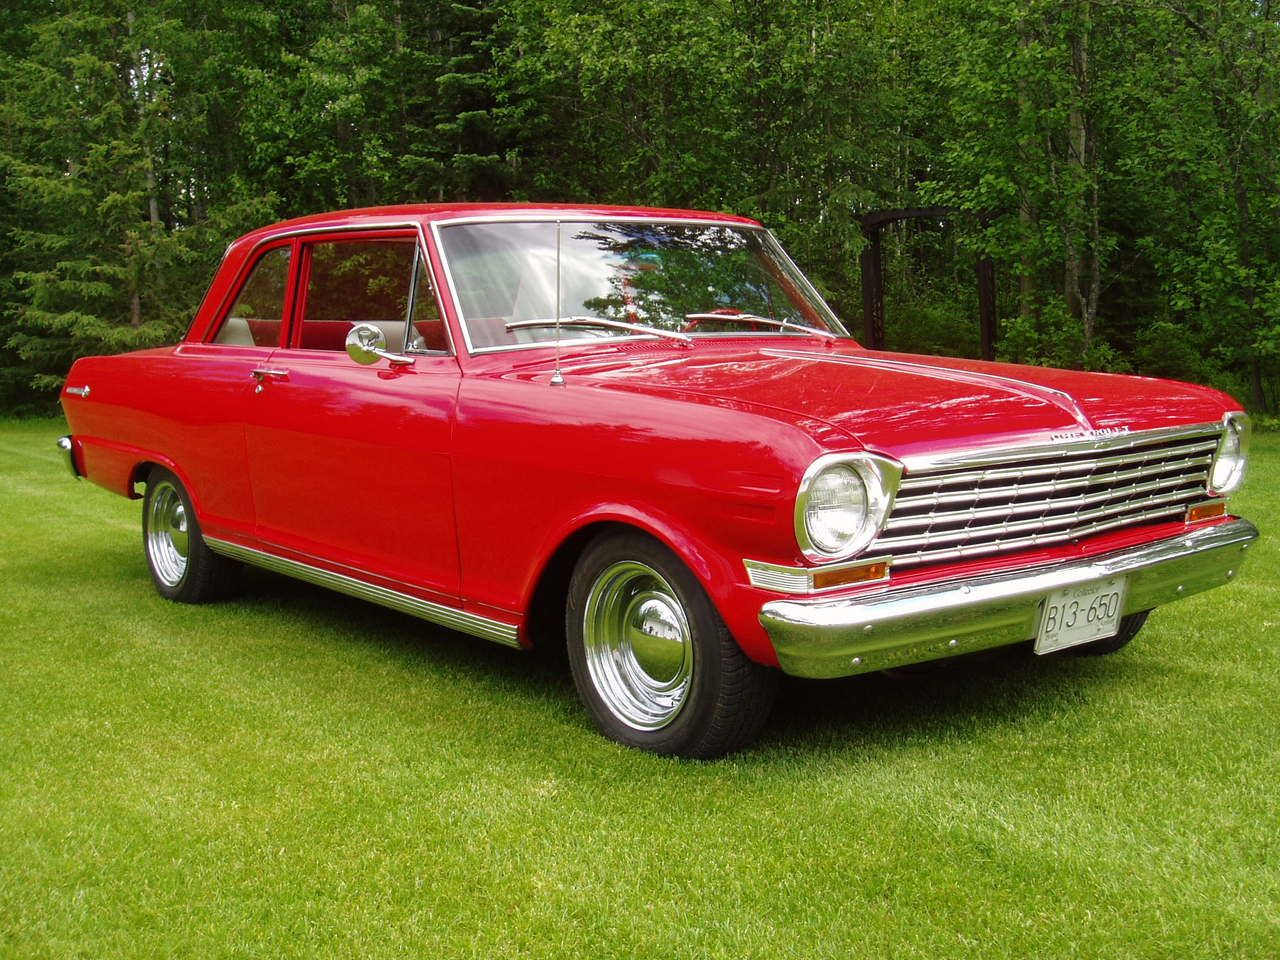 1963 Chevy Nova. Looks just like mine. 33 mpg, standard transmission ...